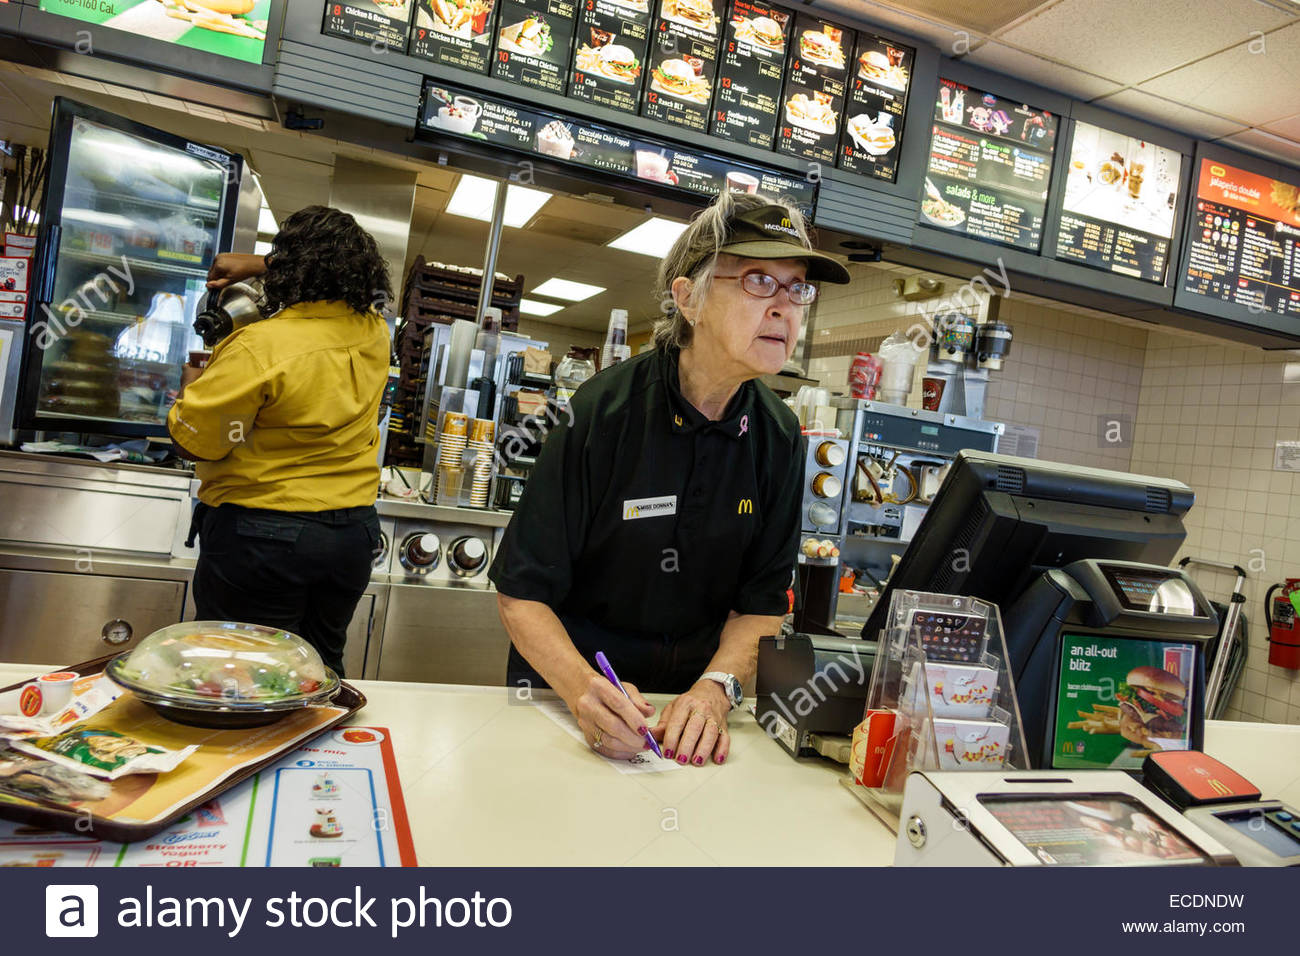 Springfield Illinois McDonald's fast food restaurant counter senior woman employee working uniform - Stock Image